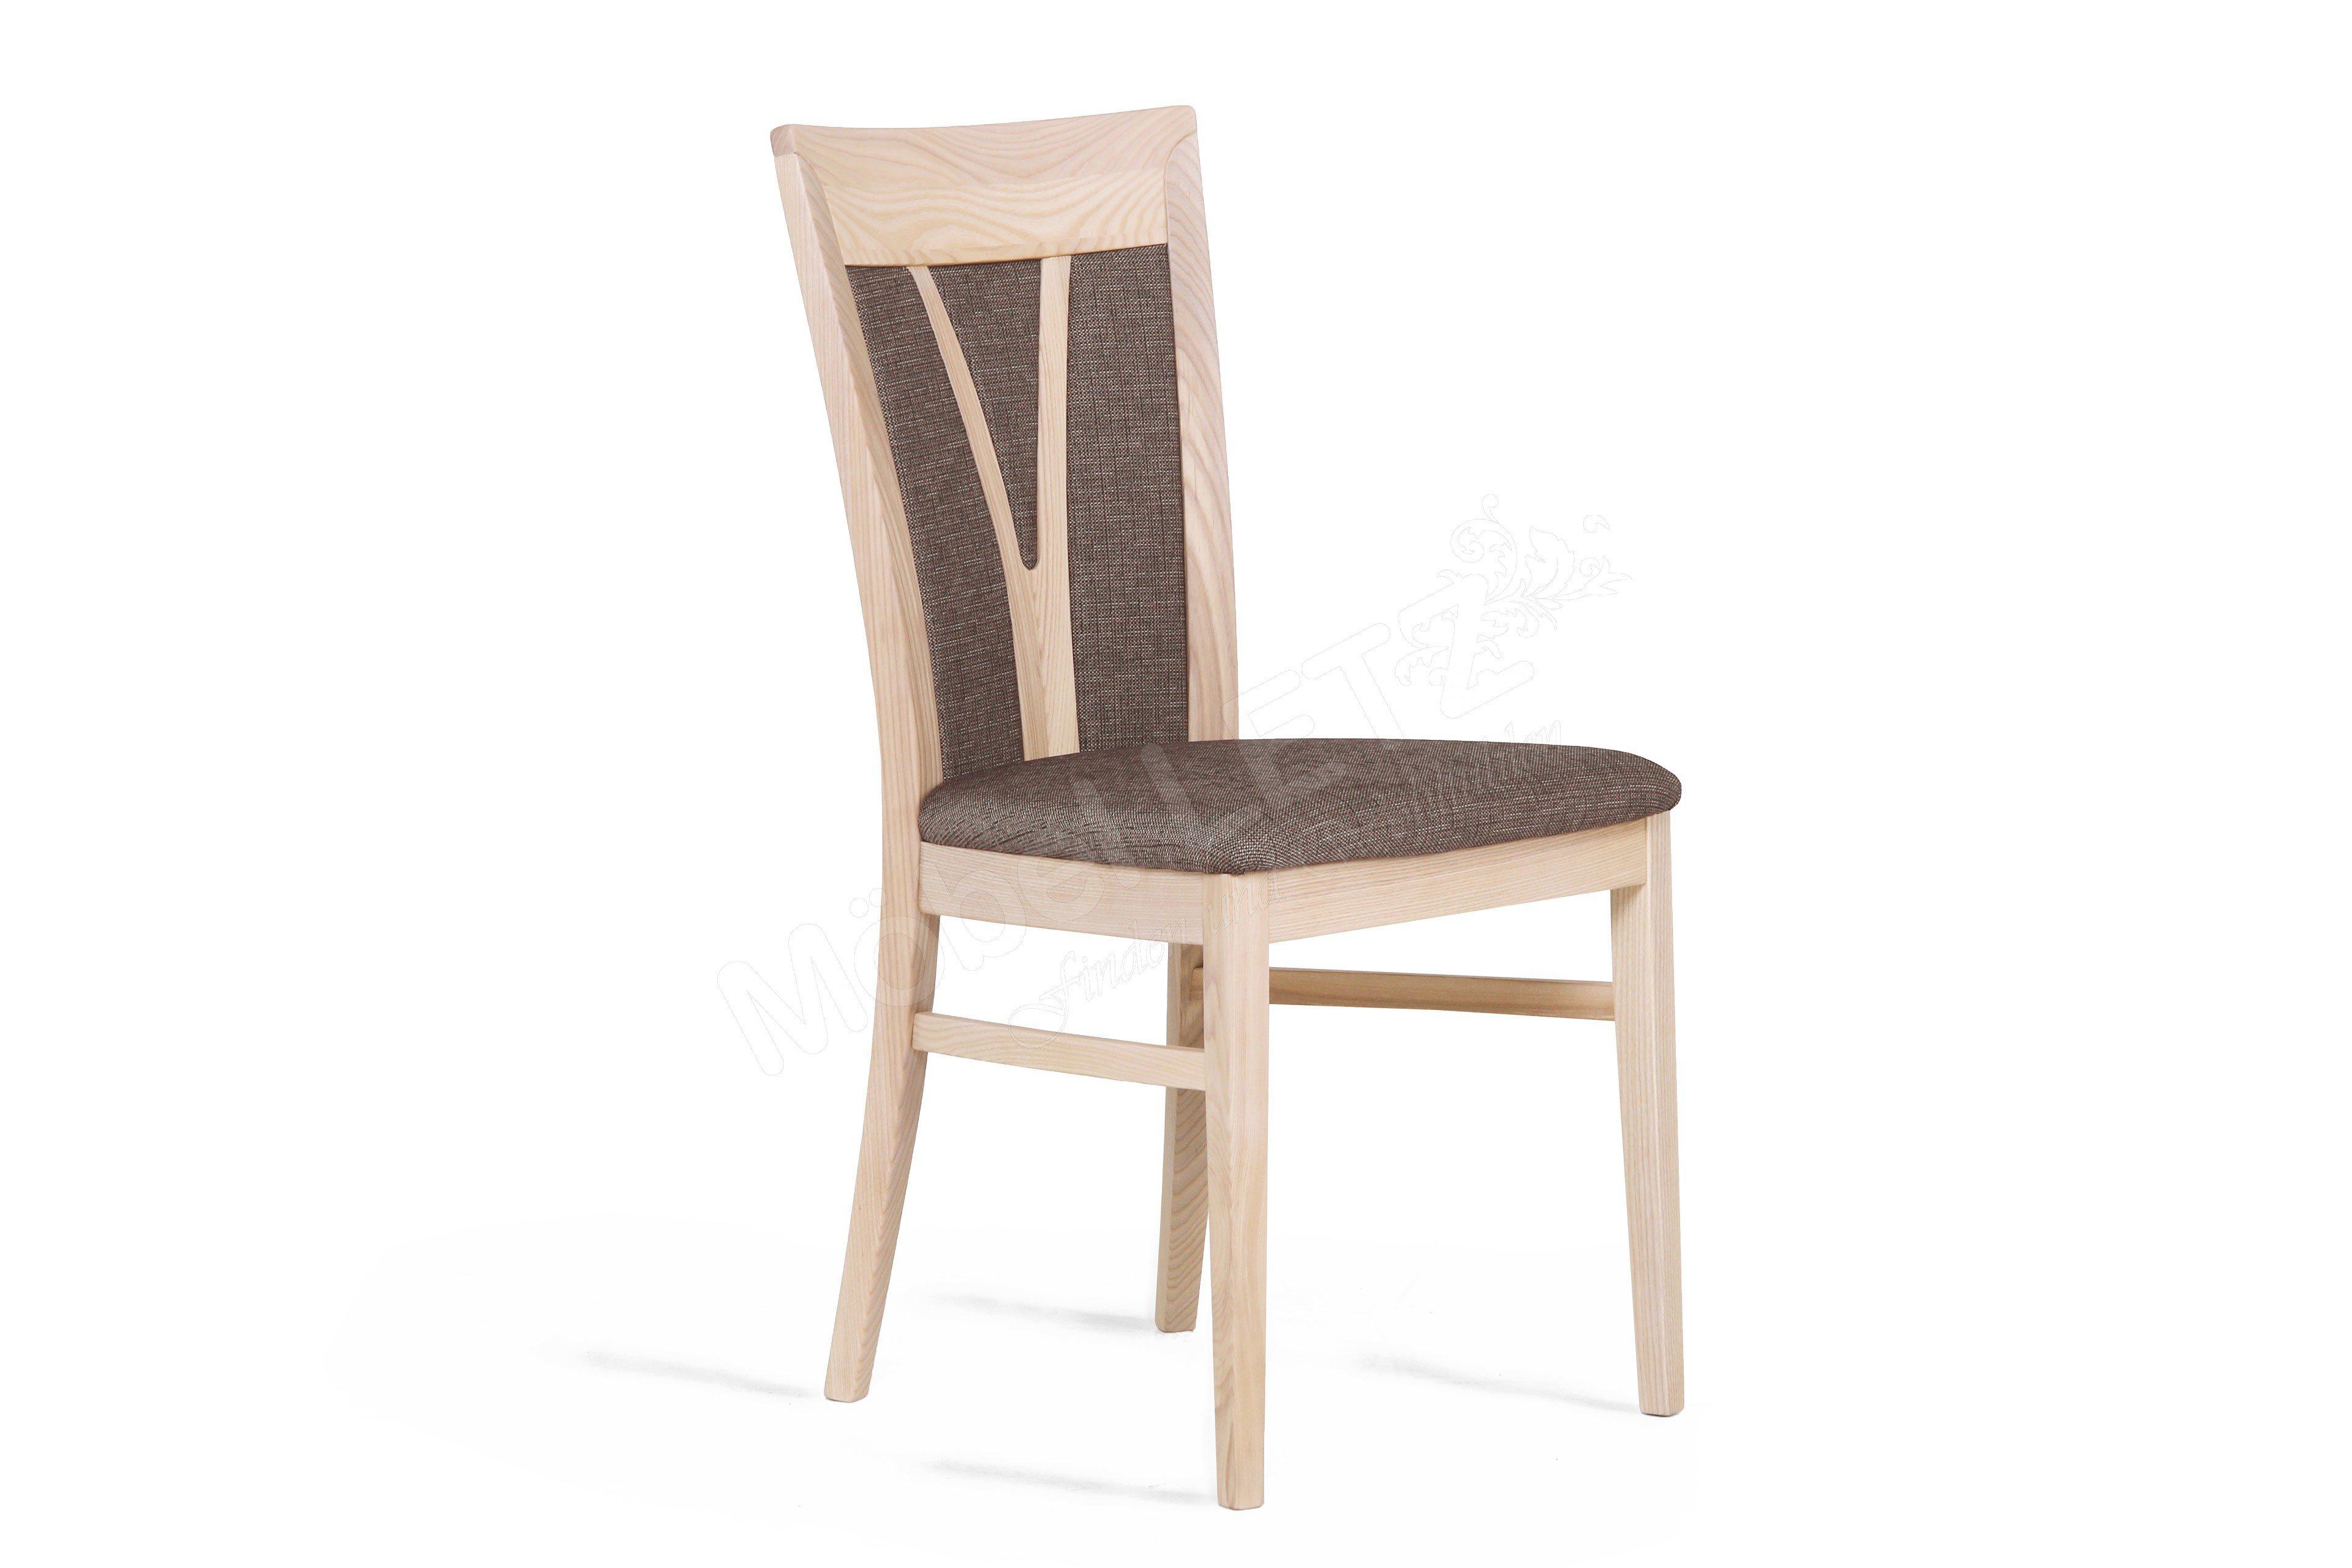 klose kollektion stuhl s11 braun kernesche m bel letz. Black Bedroom Furniture Sets. Home Design Ideas